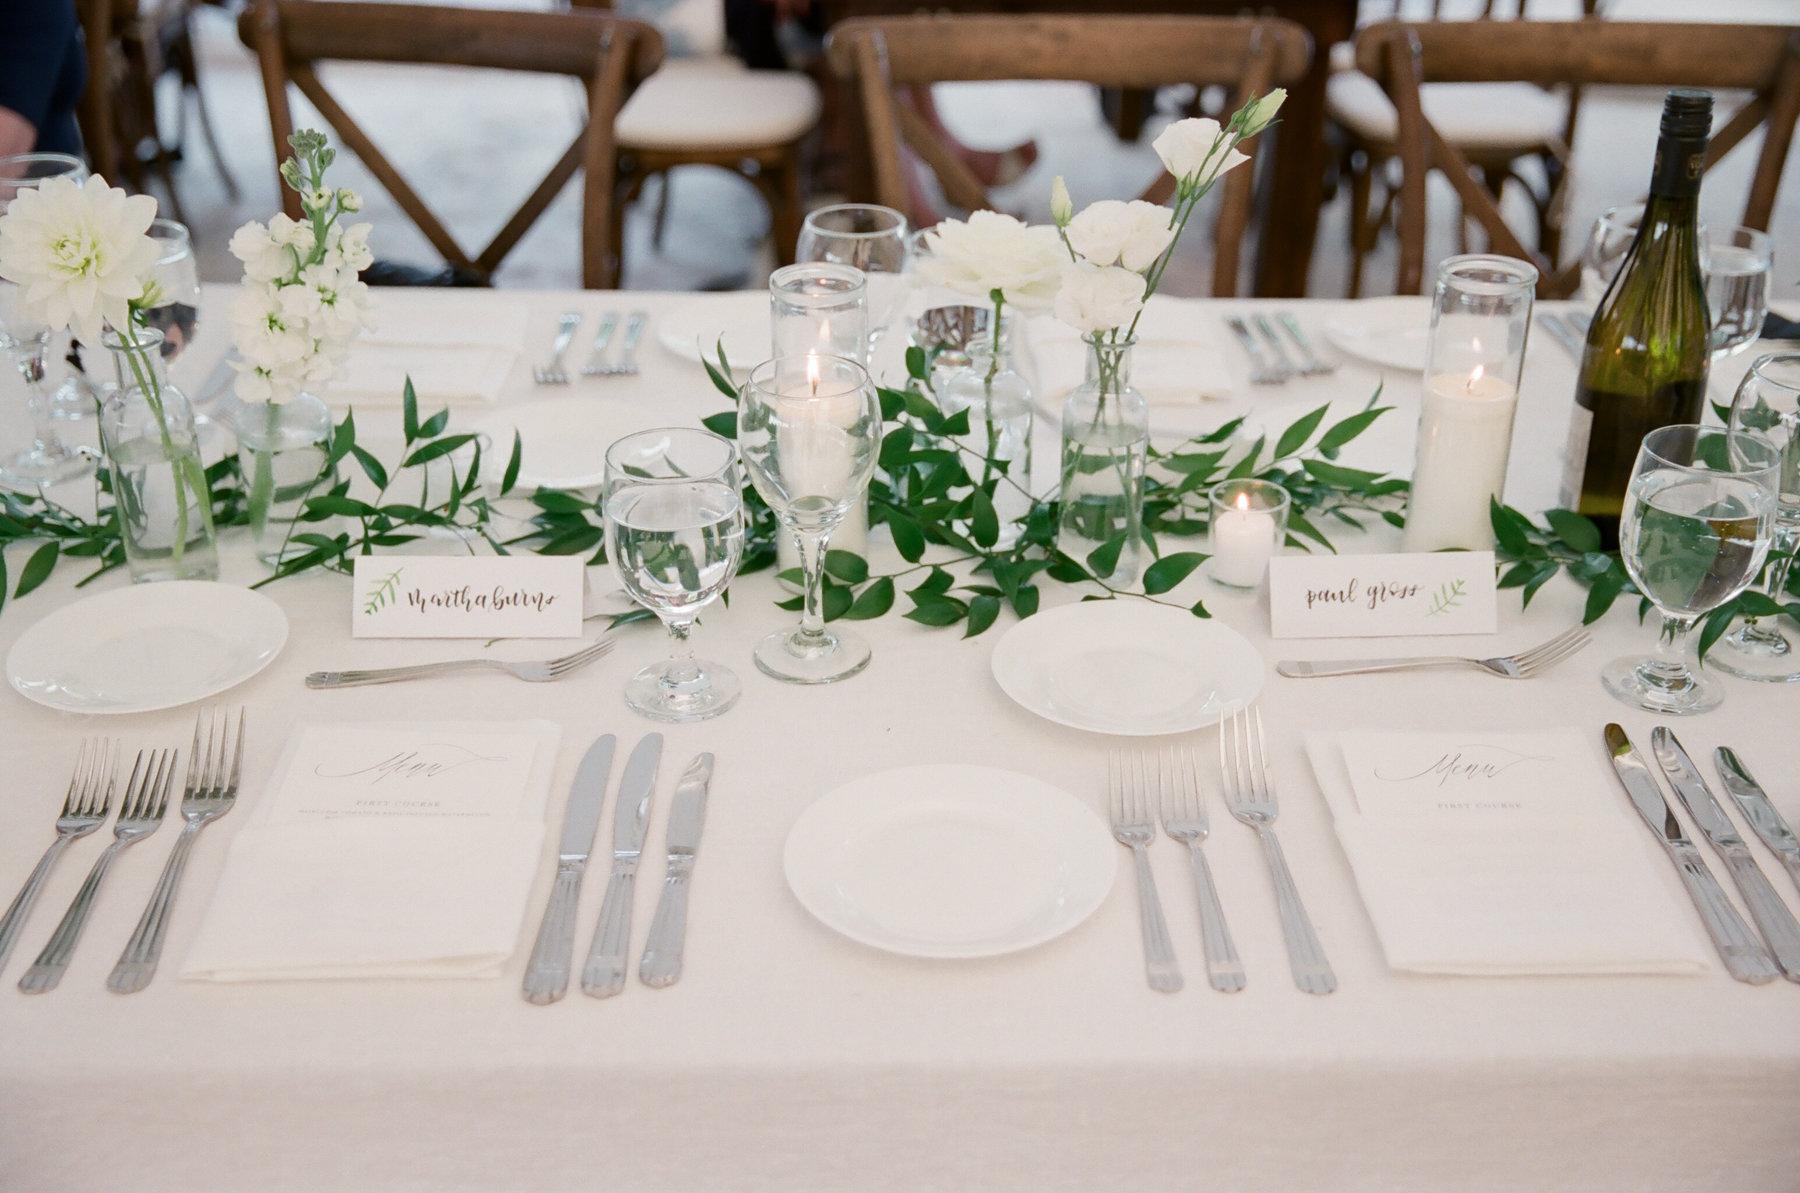 0782-maggiebrett-private-estate-wedding-000006320030.jpg